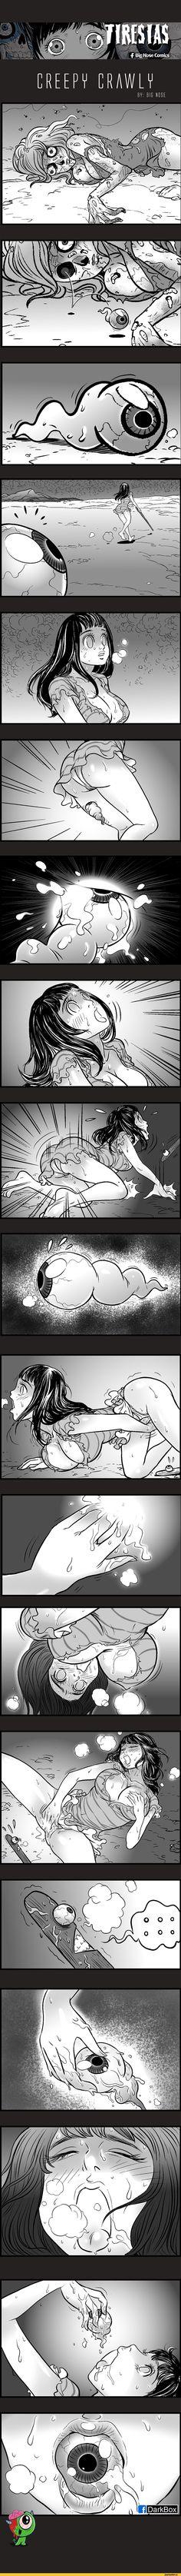 Chapter 36 Creepy Crawly Olle Cy :v Adult Cartoons, Adult Humor, Horror Comics, Funny Comics, Creepy Horror, Scary, Silent Horror, Dark Comics, Johnny Bravo